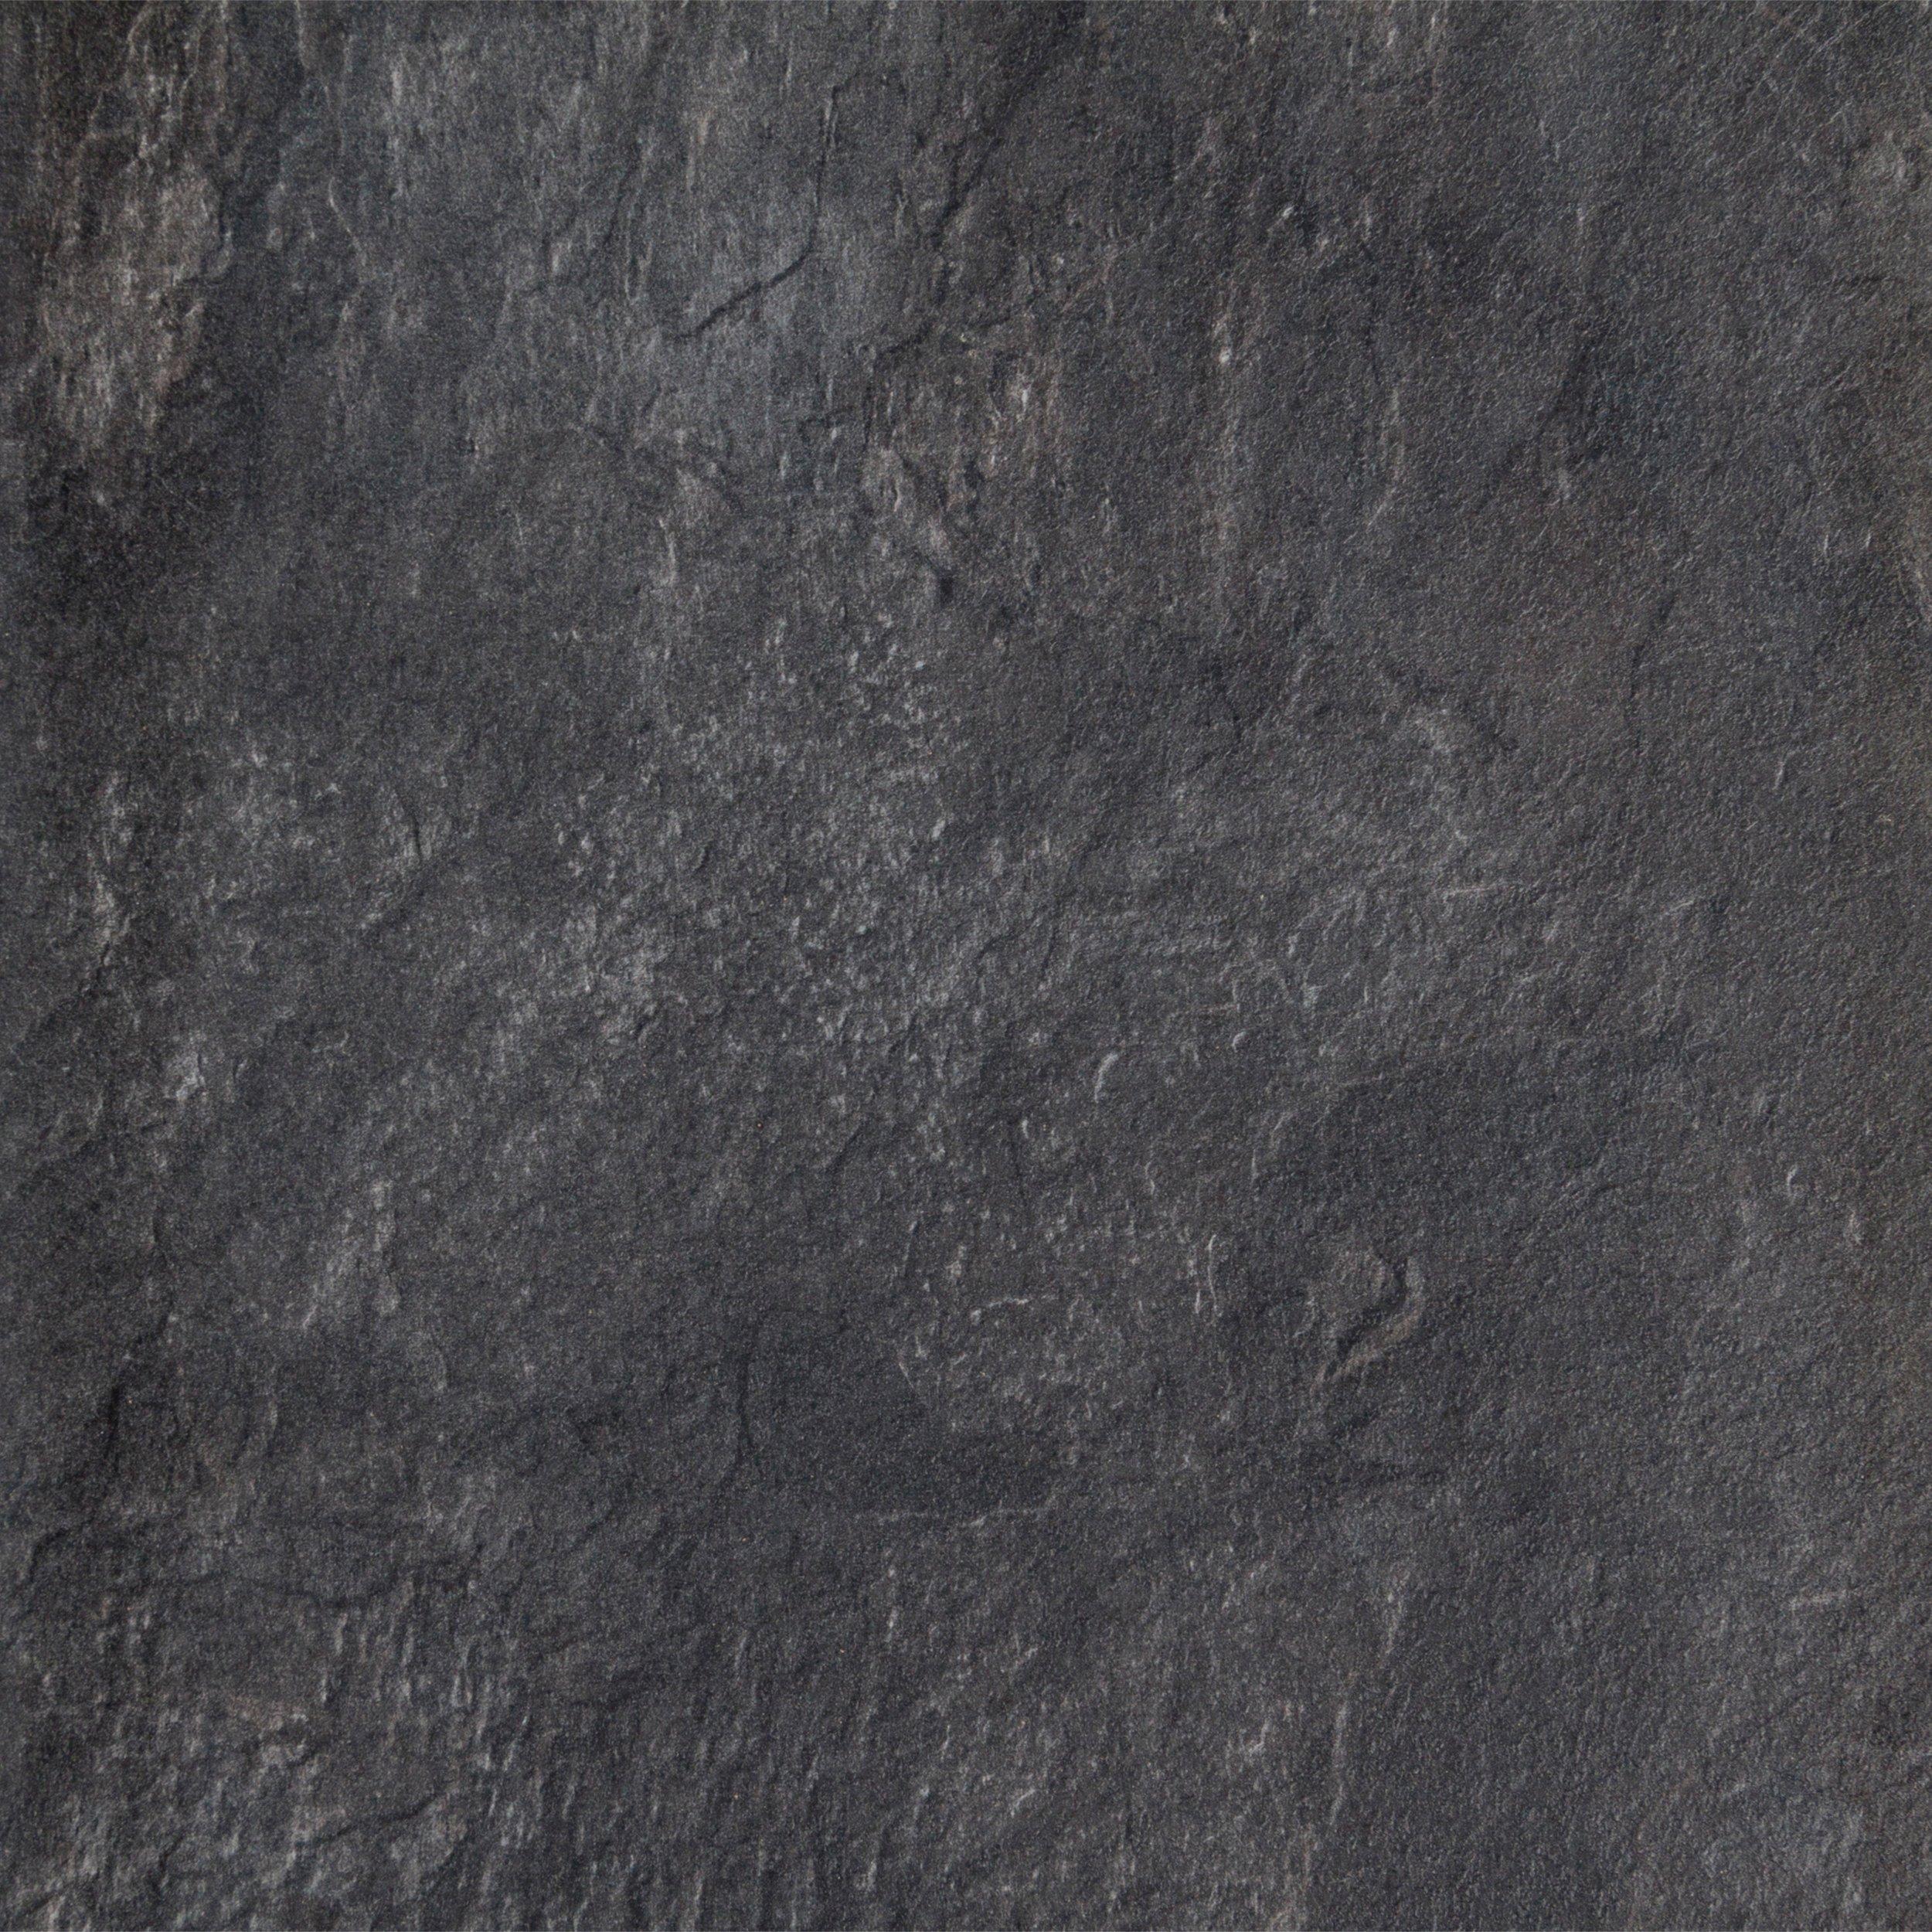 laminate stone flooring opal stone laminate - 8mm - 944101160 | floor and decor QSYJWGR